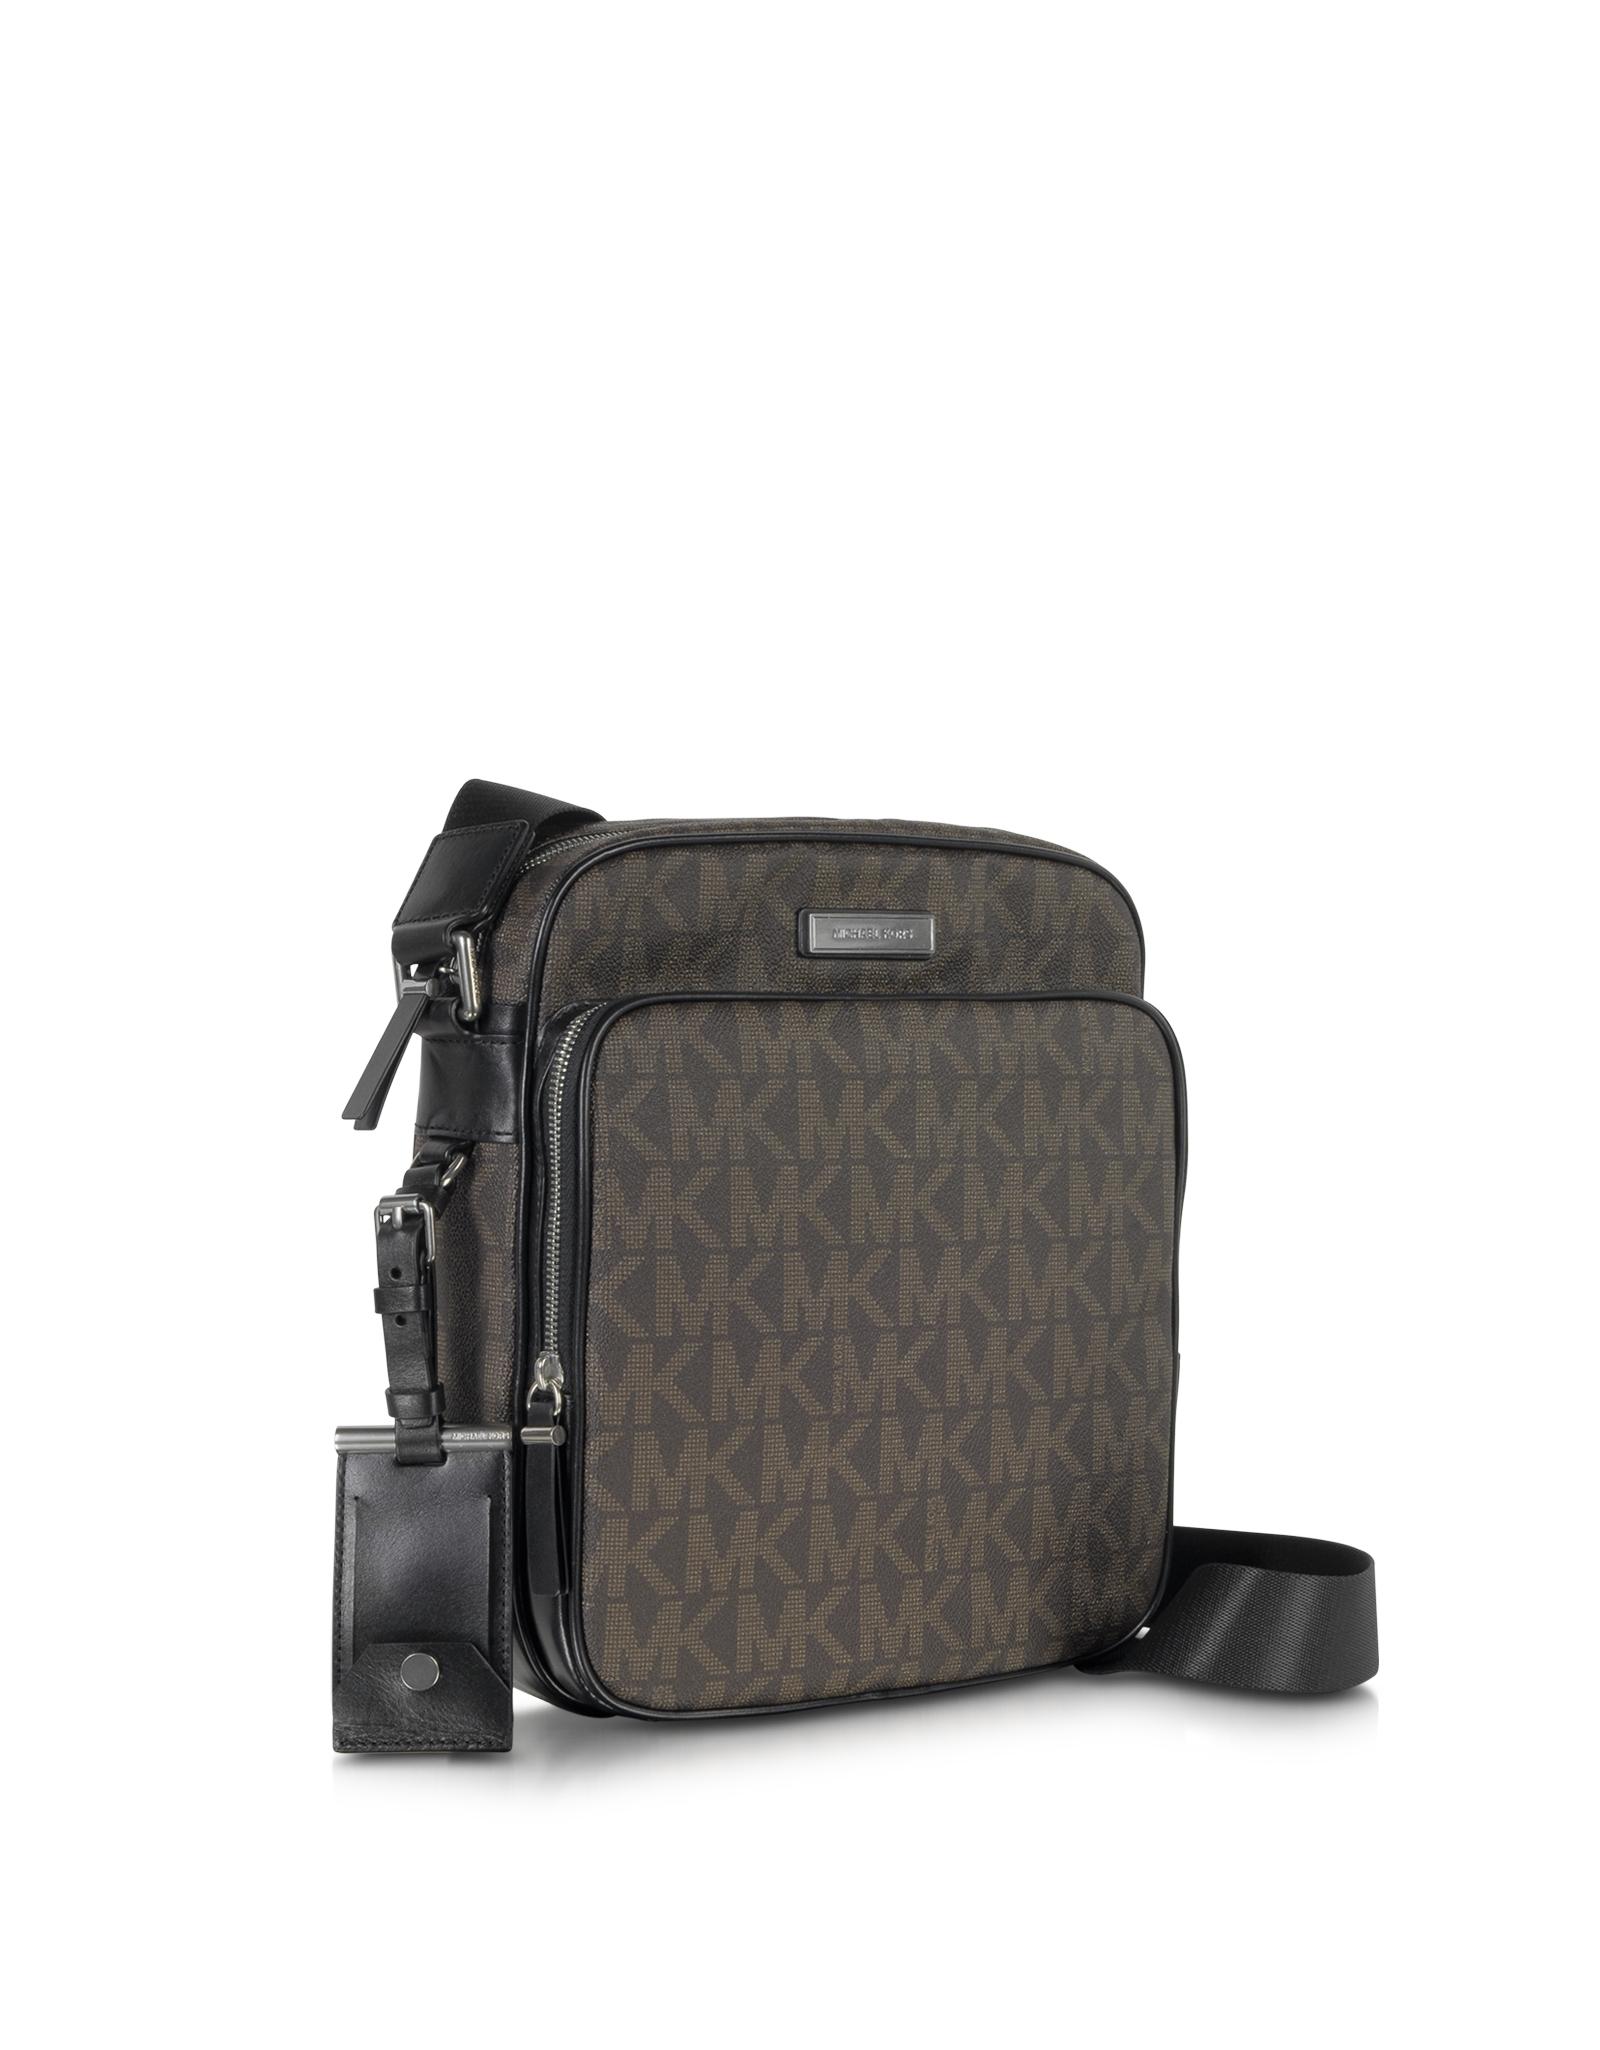 c07e0ae9ea0f Michael Kors Brown Woven Signature Messenger Mens Bag in Brown for ...